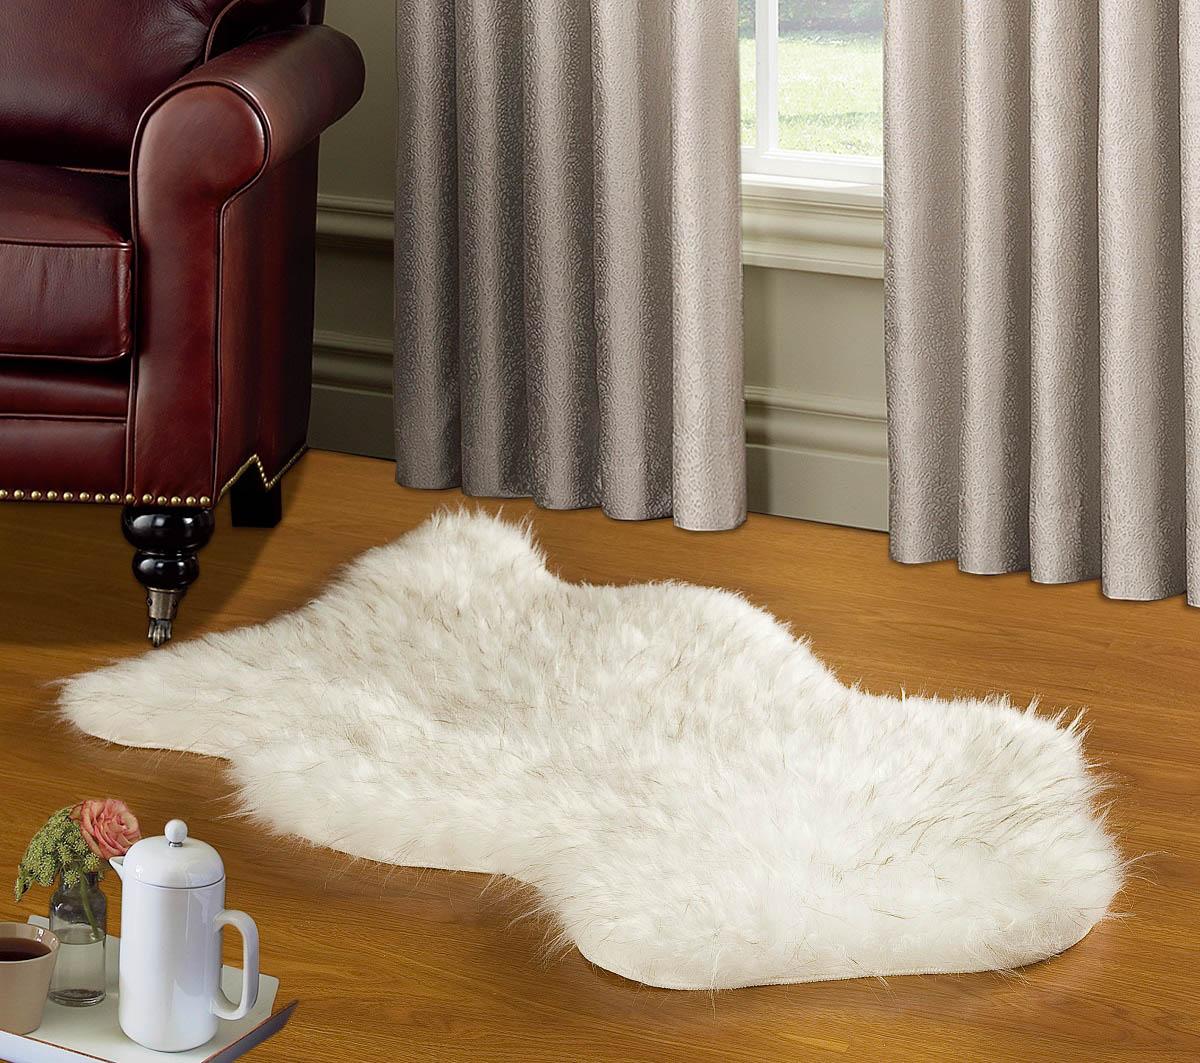 {} Modalin Коврик для дома Manal Цвет: Натурал (75х110 см) modalin modalin полотенце petek цвет розовый 70х140 см